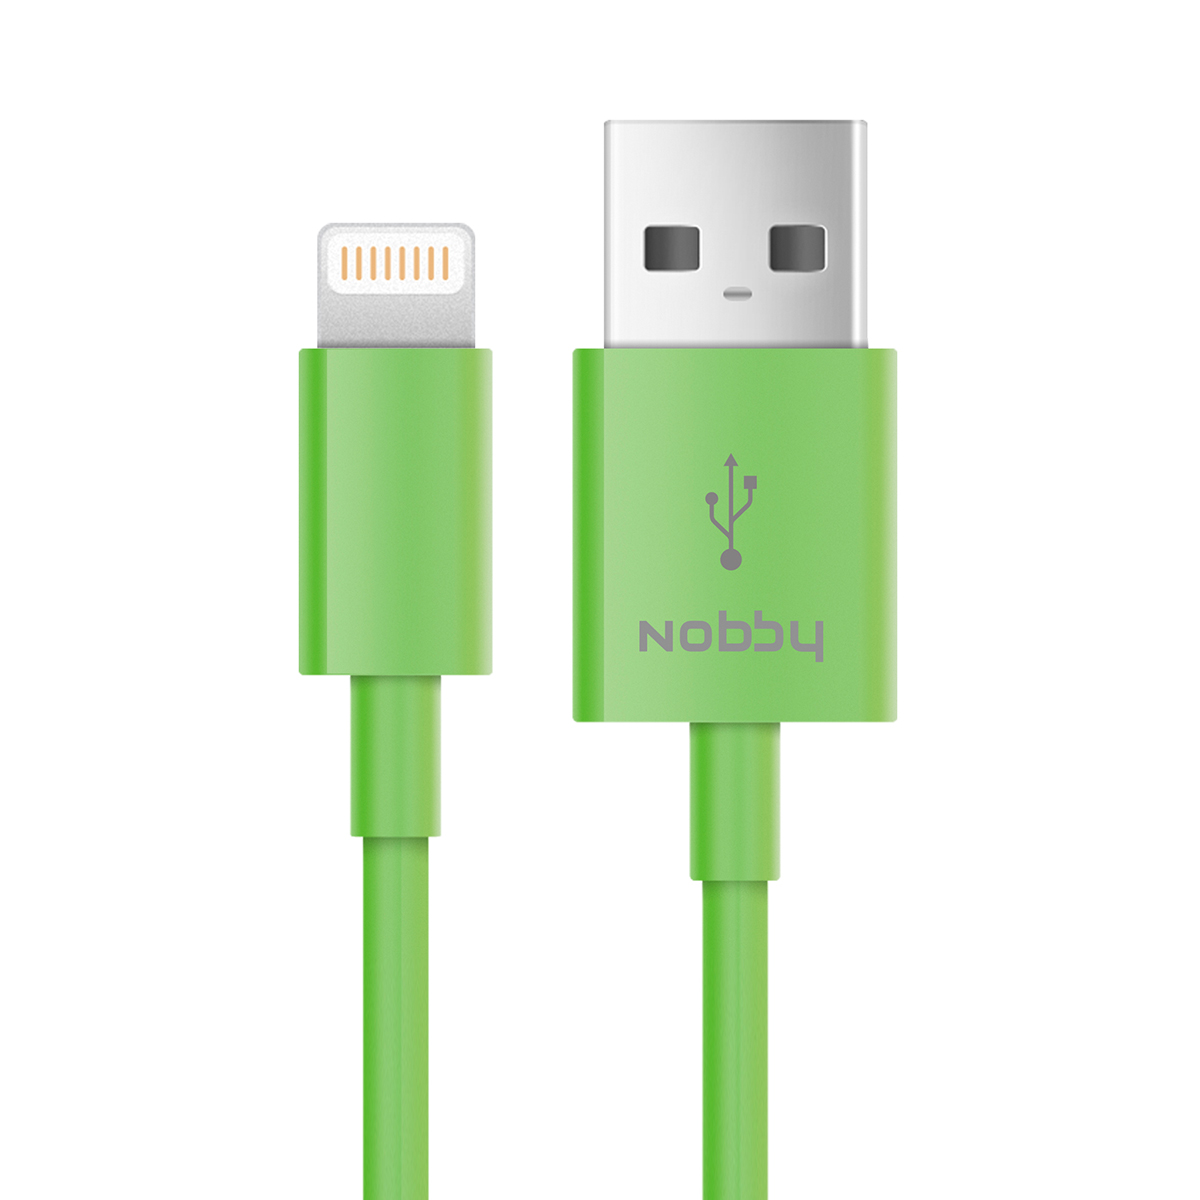 Nobby Connect DT-005, Green кабель USB-Lightning (1 м)7726USB-s8pin; ток макс. нагрузки 2.1А; раб. напряжение 4.8-5.5 Вт; стандарт USB 2.0;скорость передачи данных до 480 Мбит/сек; 1м; PVC; 22г.